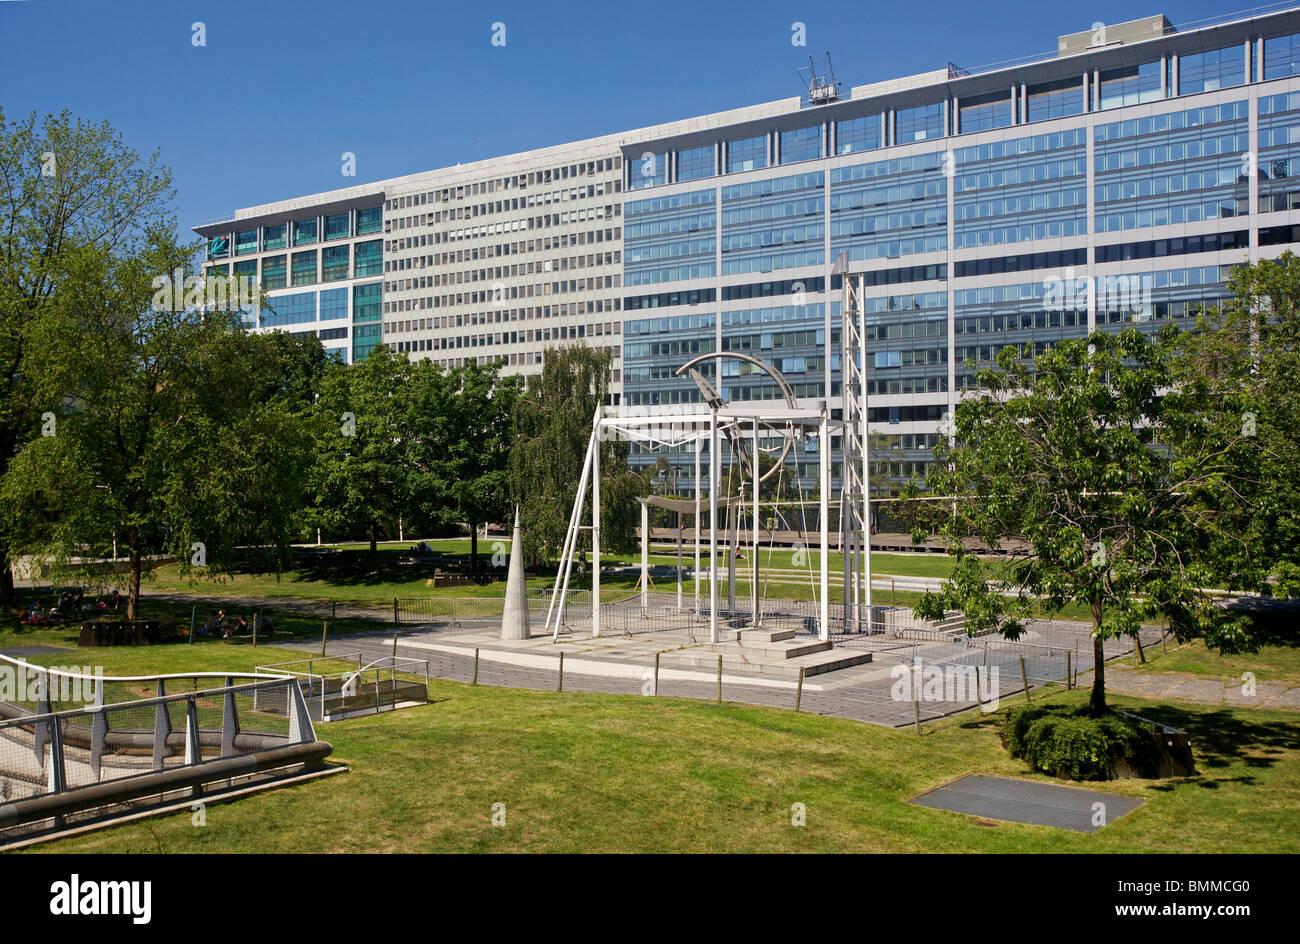 jardin atlantique la gare montparnasse paris france - Jardin Atlantique